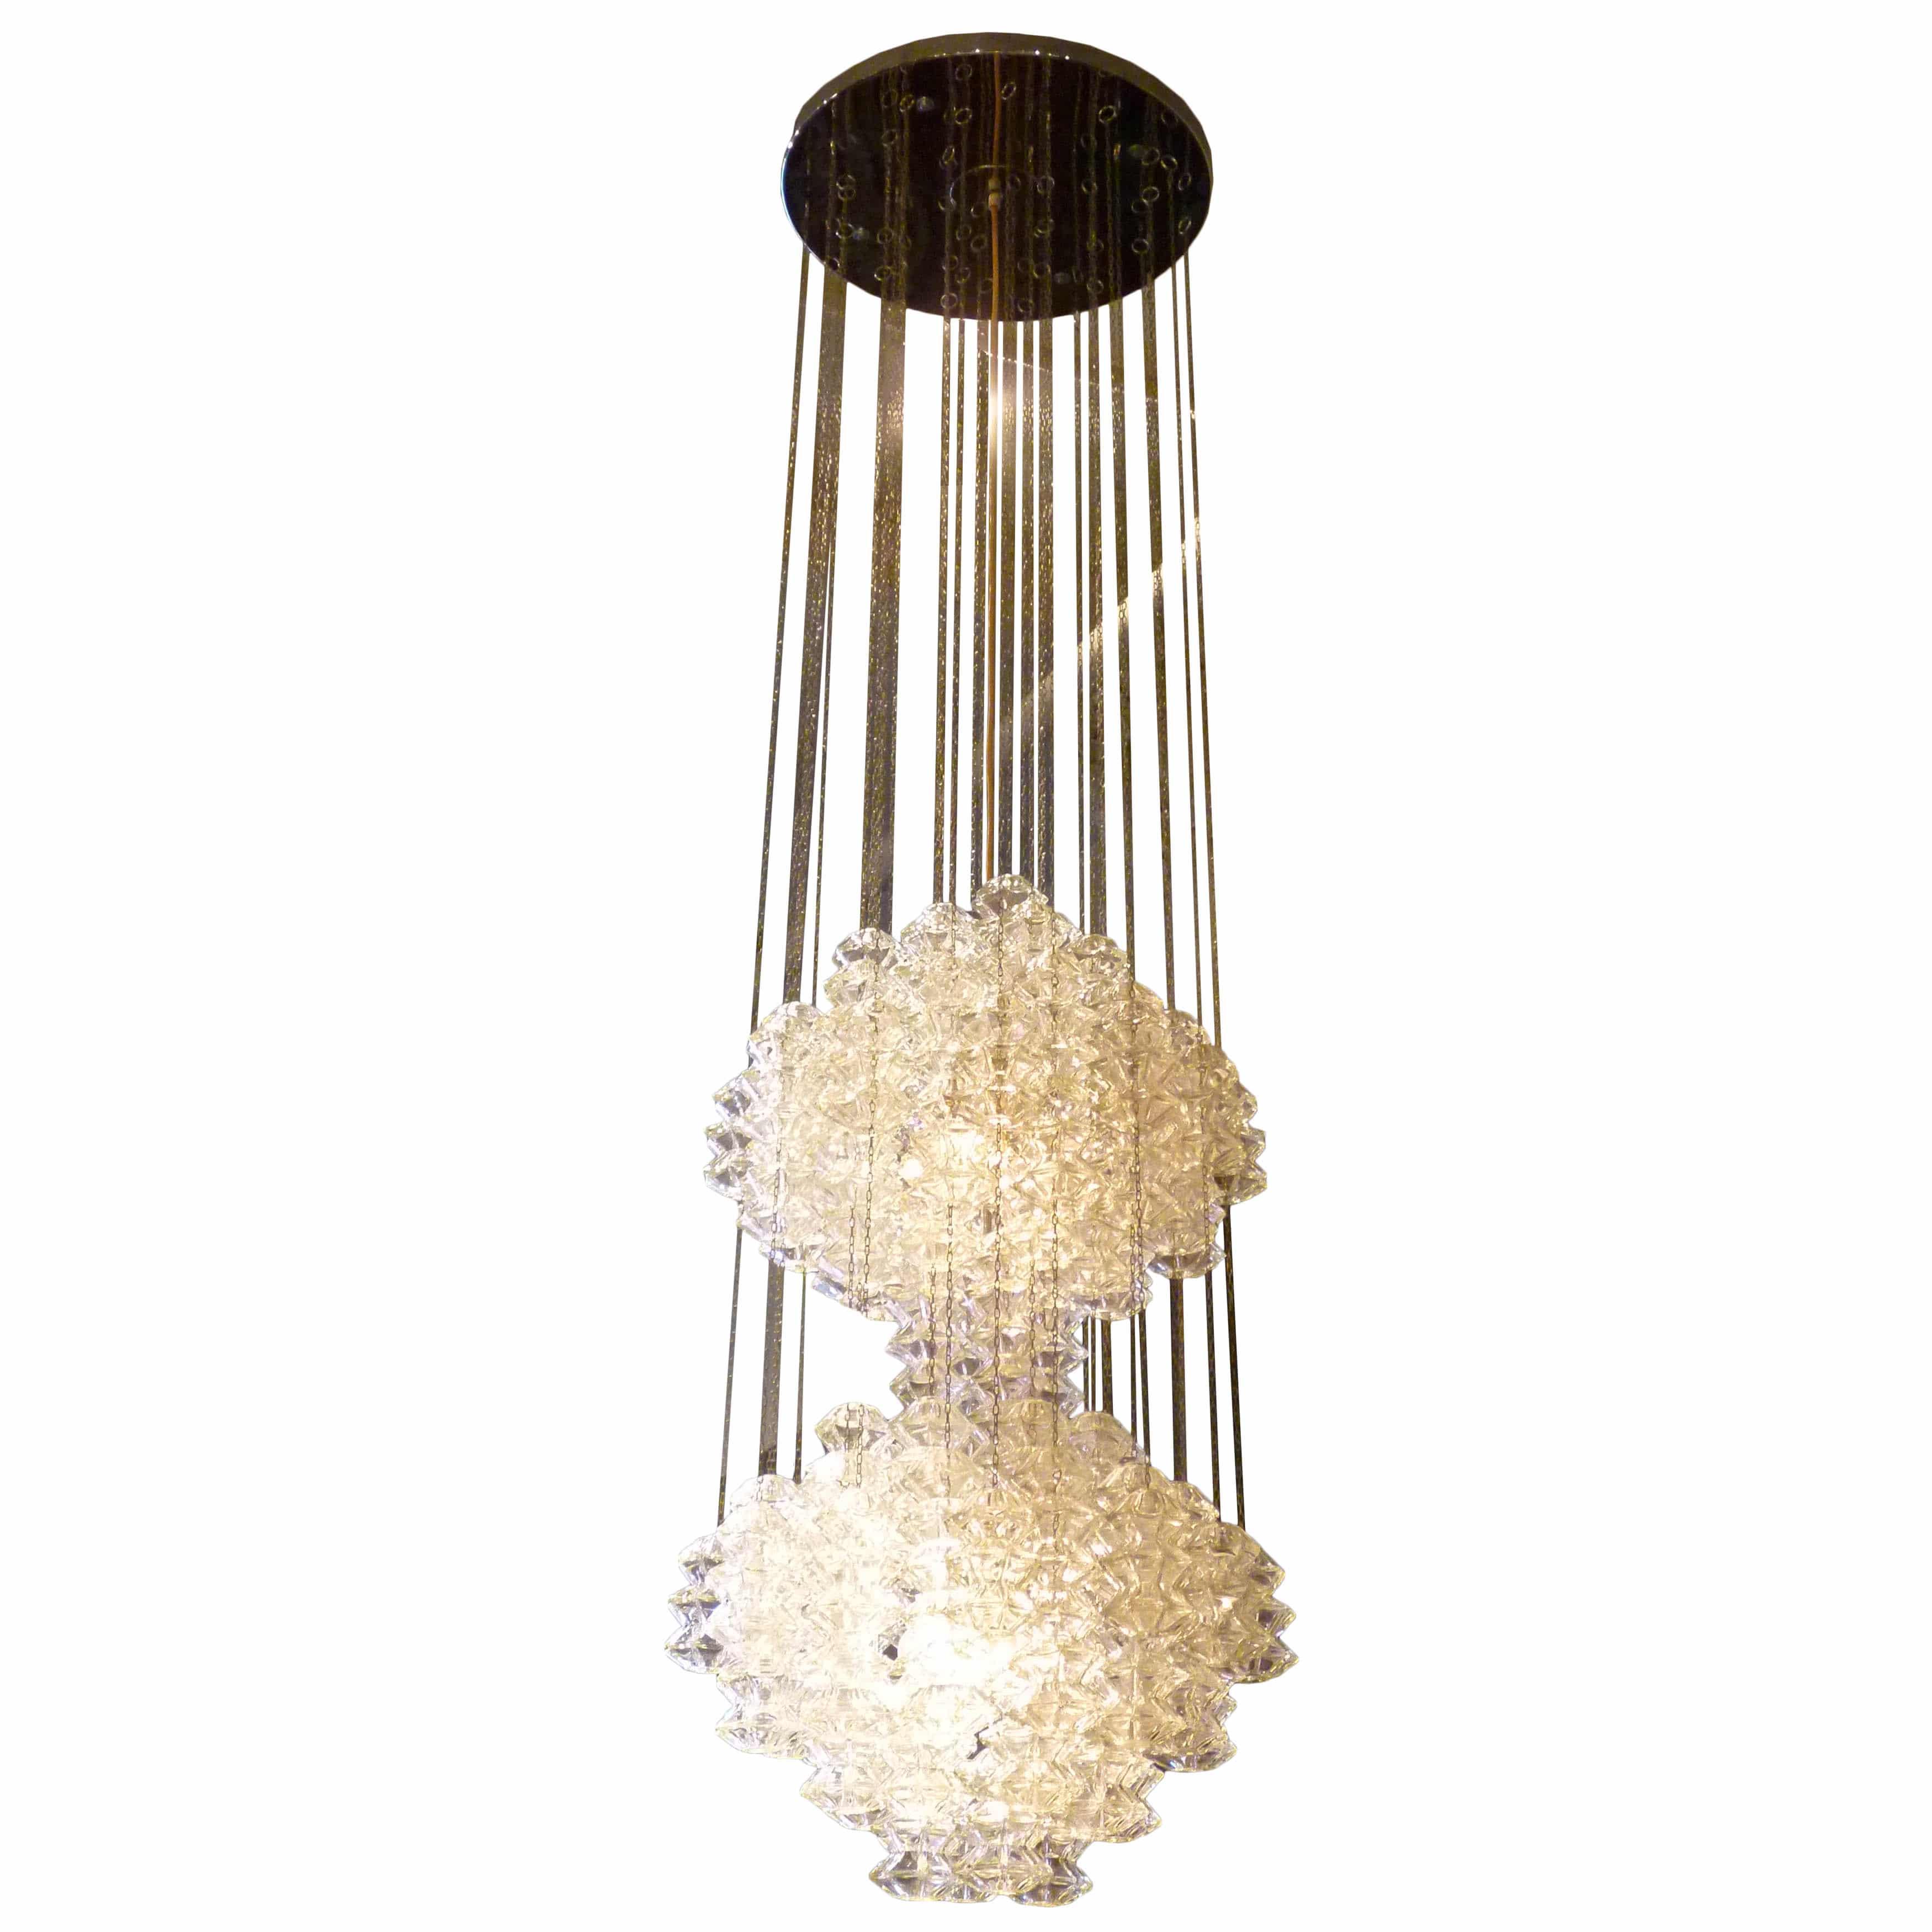 metal pagoda traditional chandeliers lighting co chandelier lobmeyr glass dering ceiling kneen hall